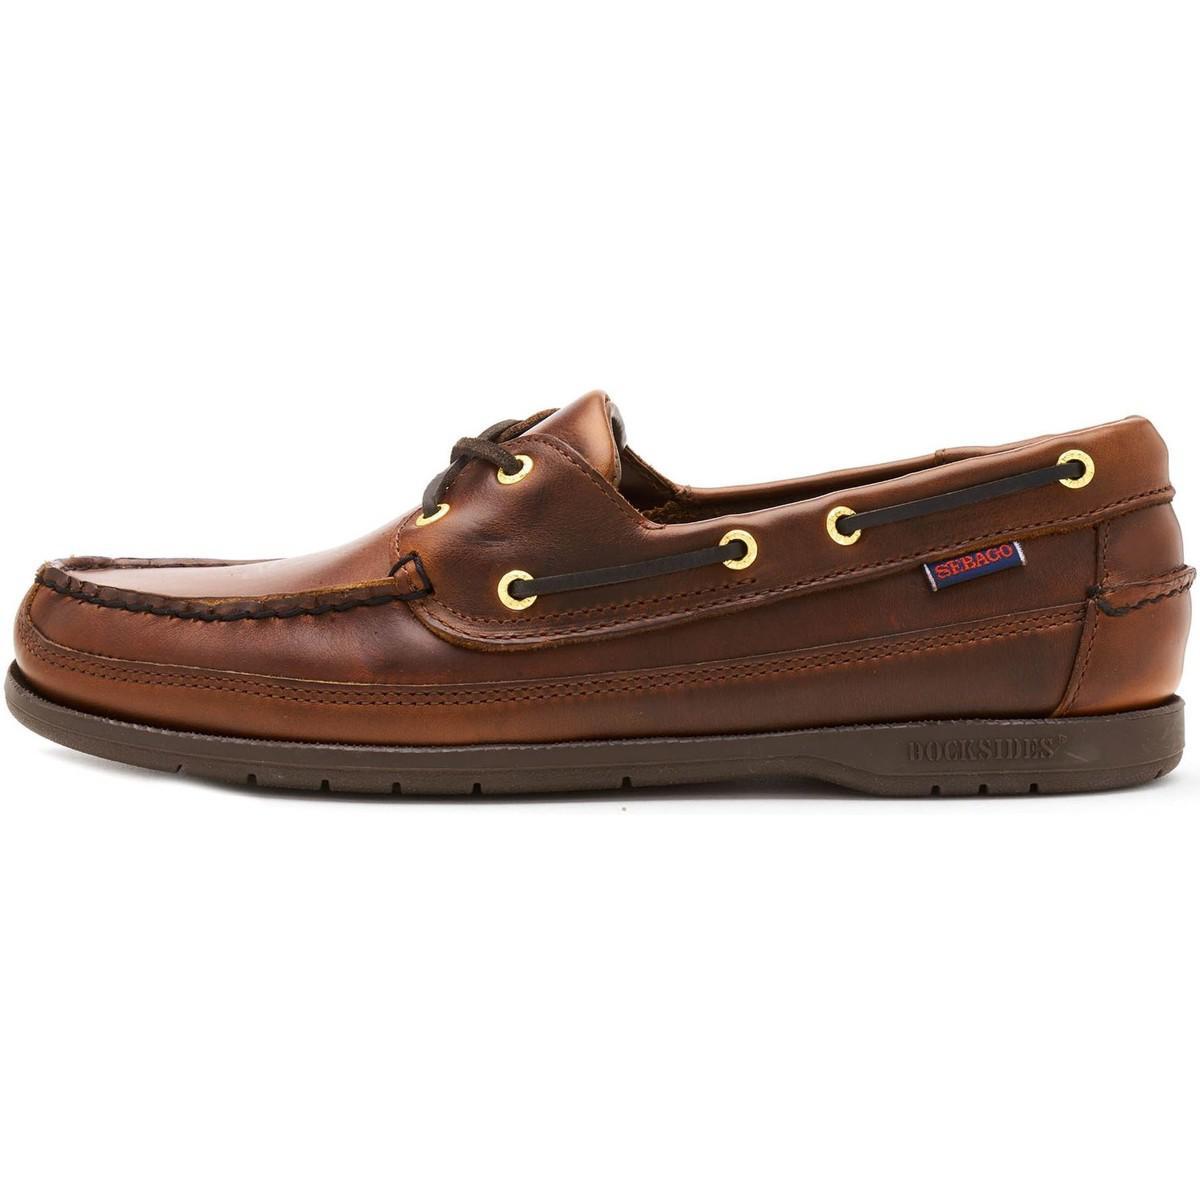 7e954e358d431 Tap to visit site. Sebago - Schooner Fgl Waxed Leather Boat Deck Shoes ...